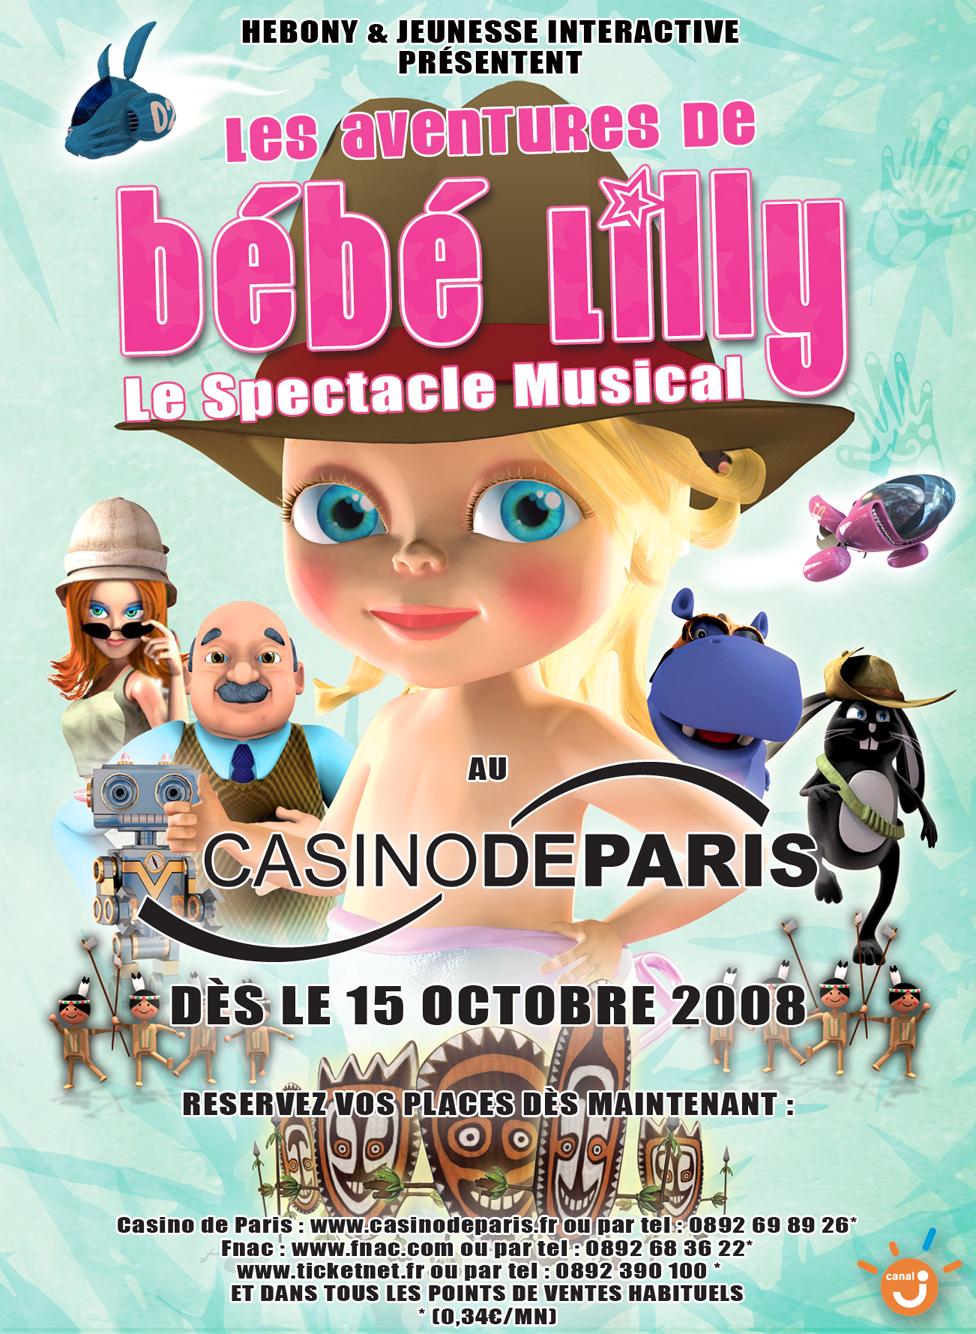 Bébé Lilly - Images - Bébé Lilly - Héros Tiji à Jeux De Bébé Lilly